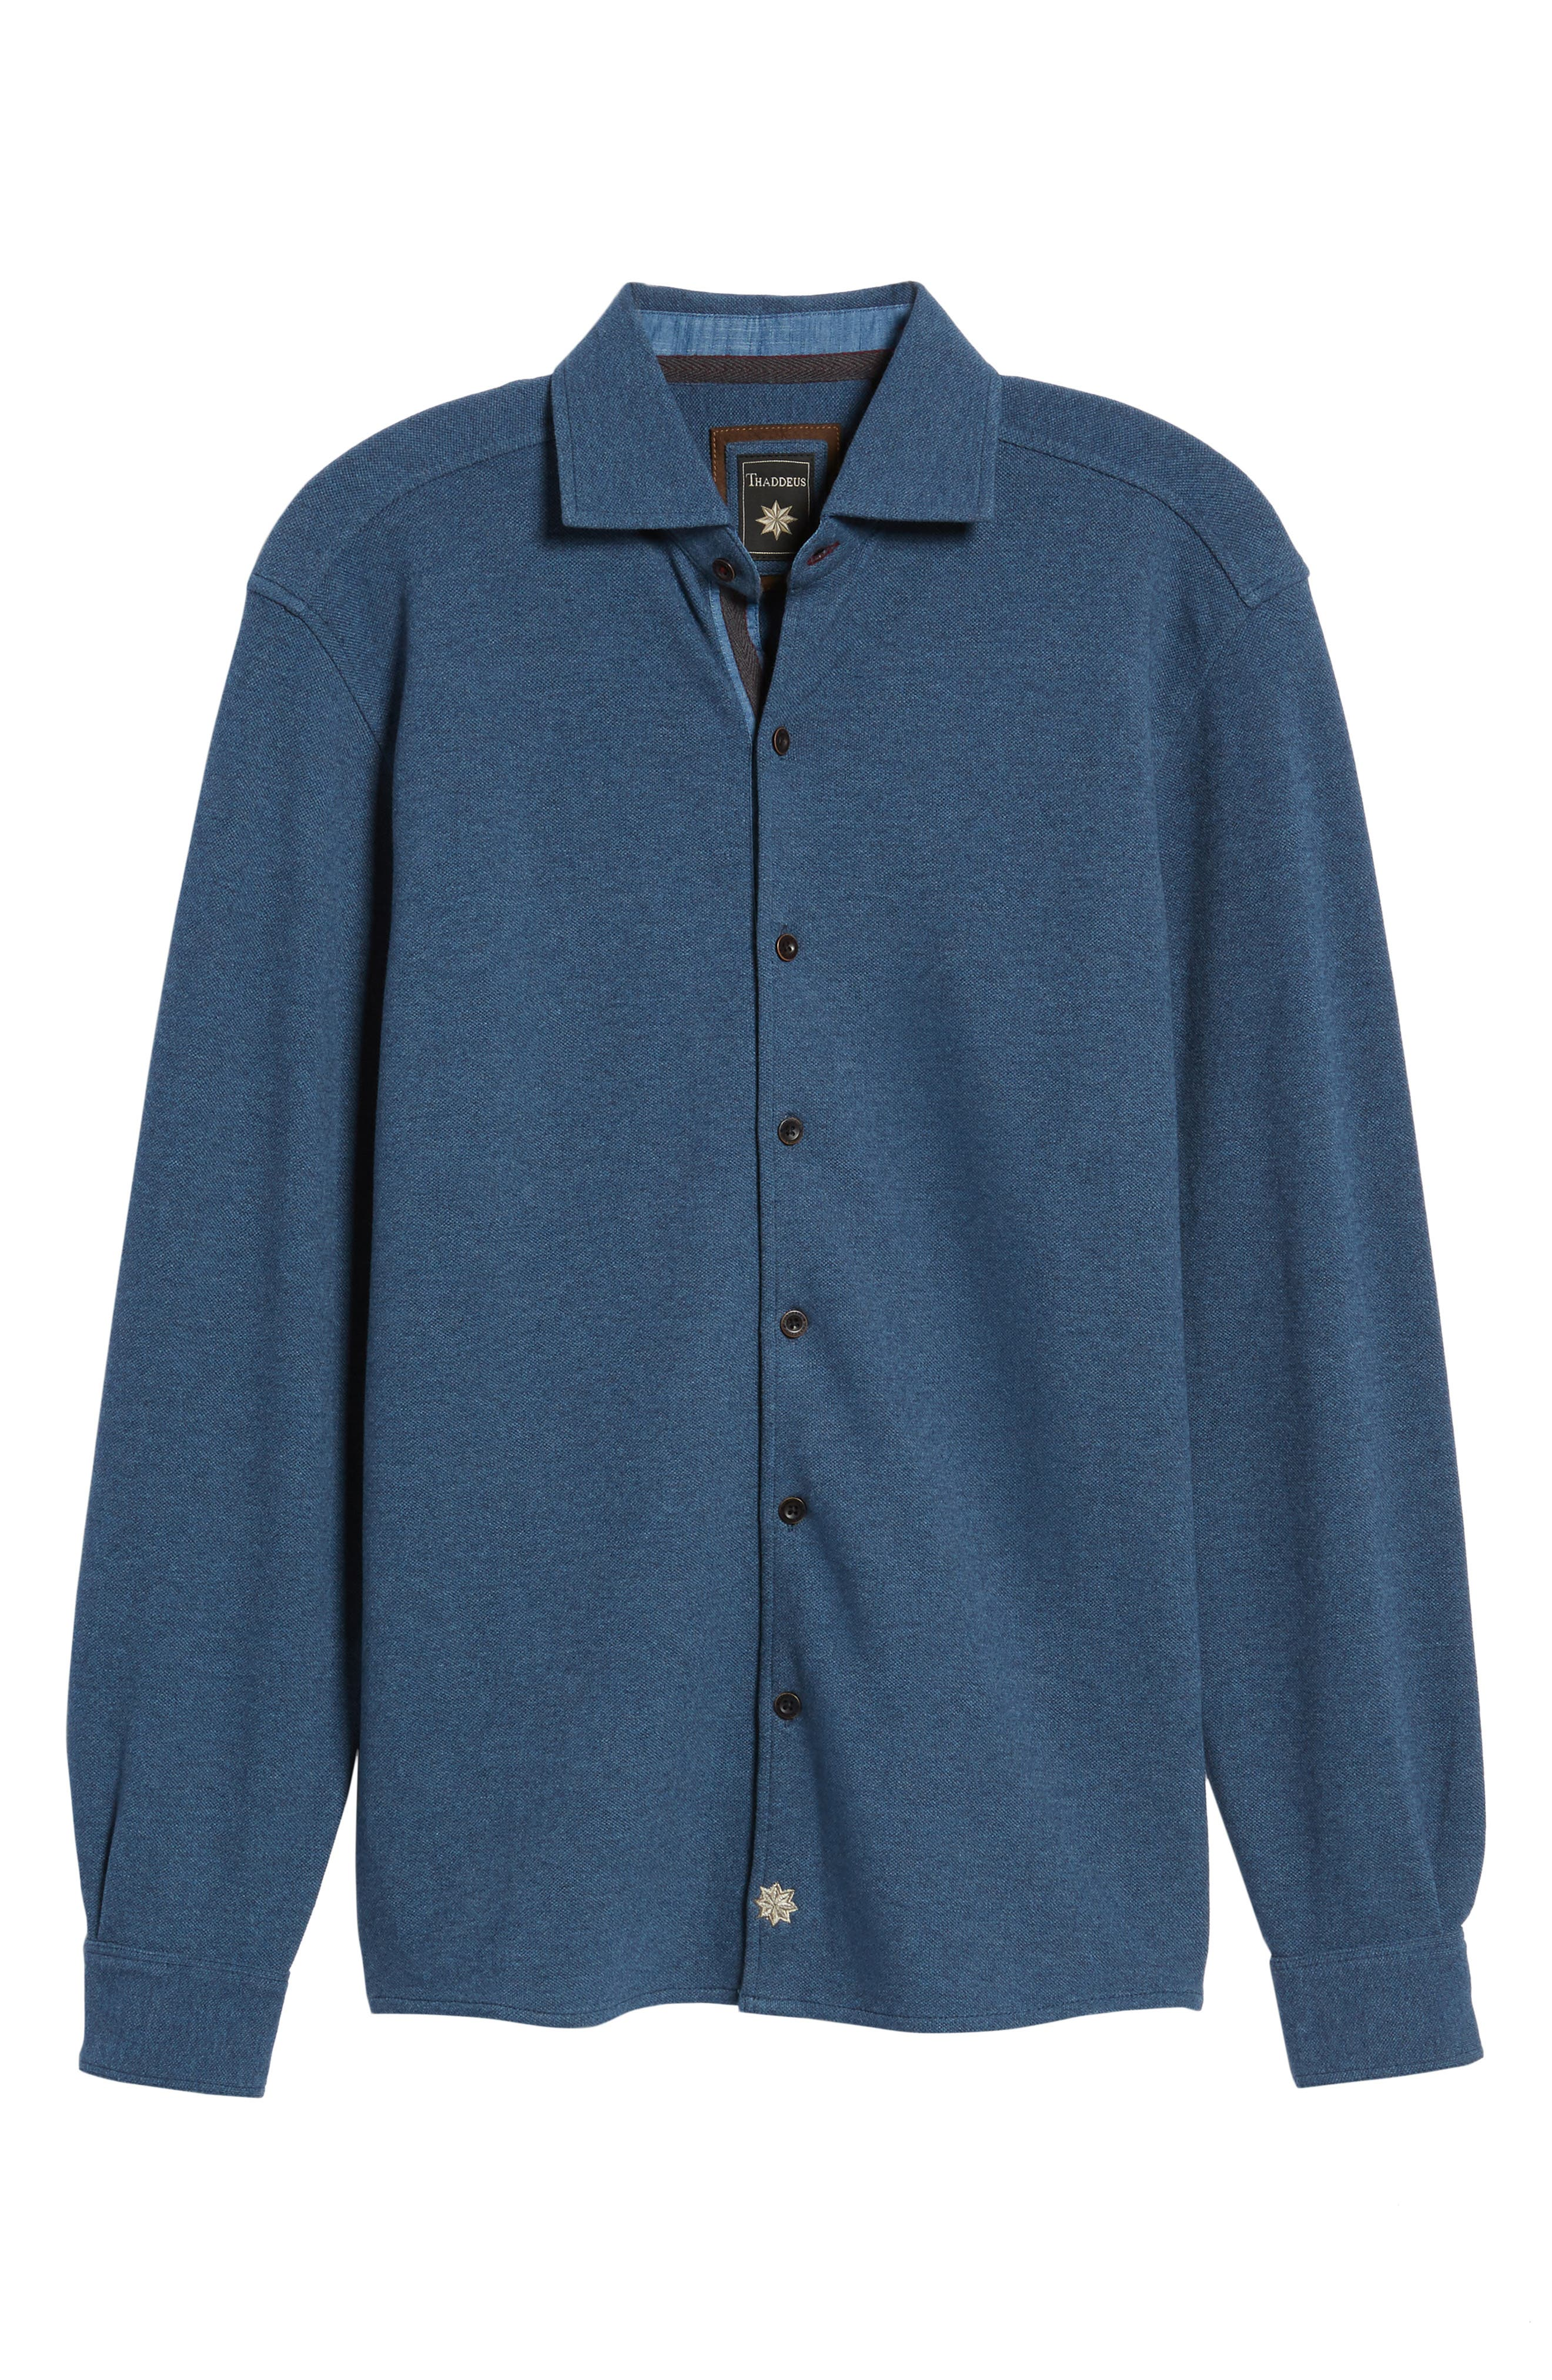 Shandy Heathered Knit Sport Shirt,                             Alternate thumbnail 12, color,